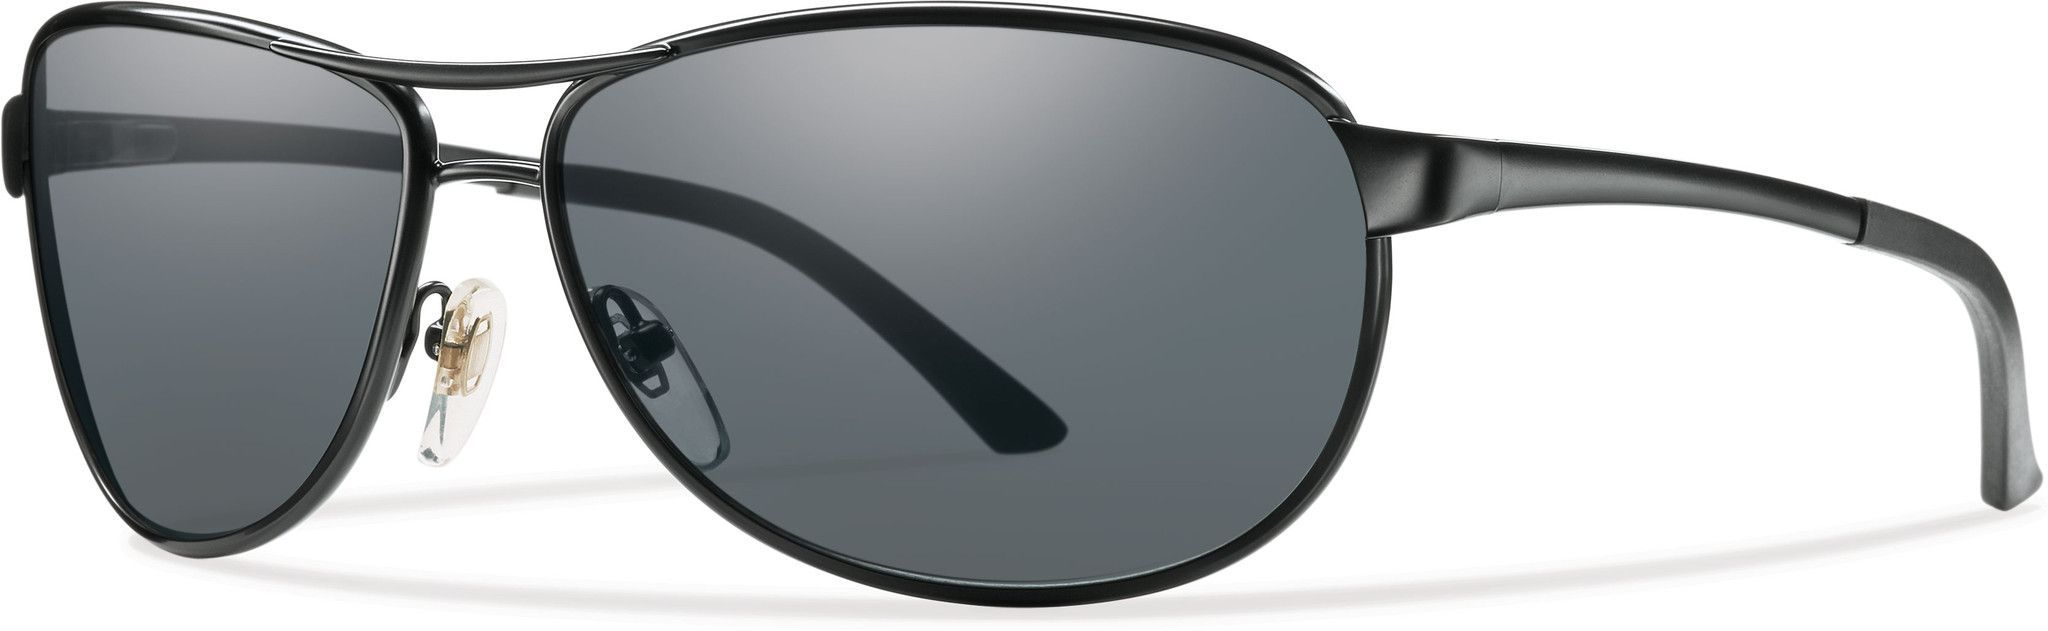 Smith Elite Gray Man Tactical Tactical sunglasses, Mens